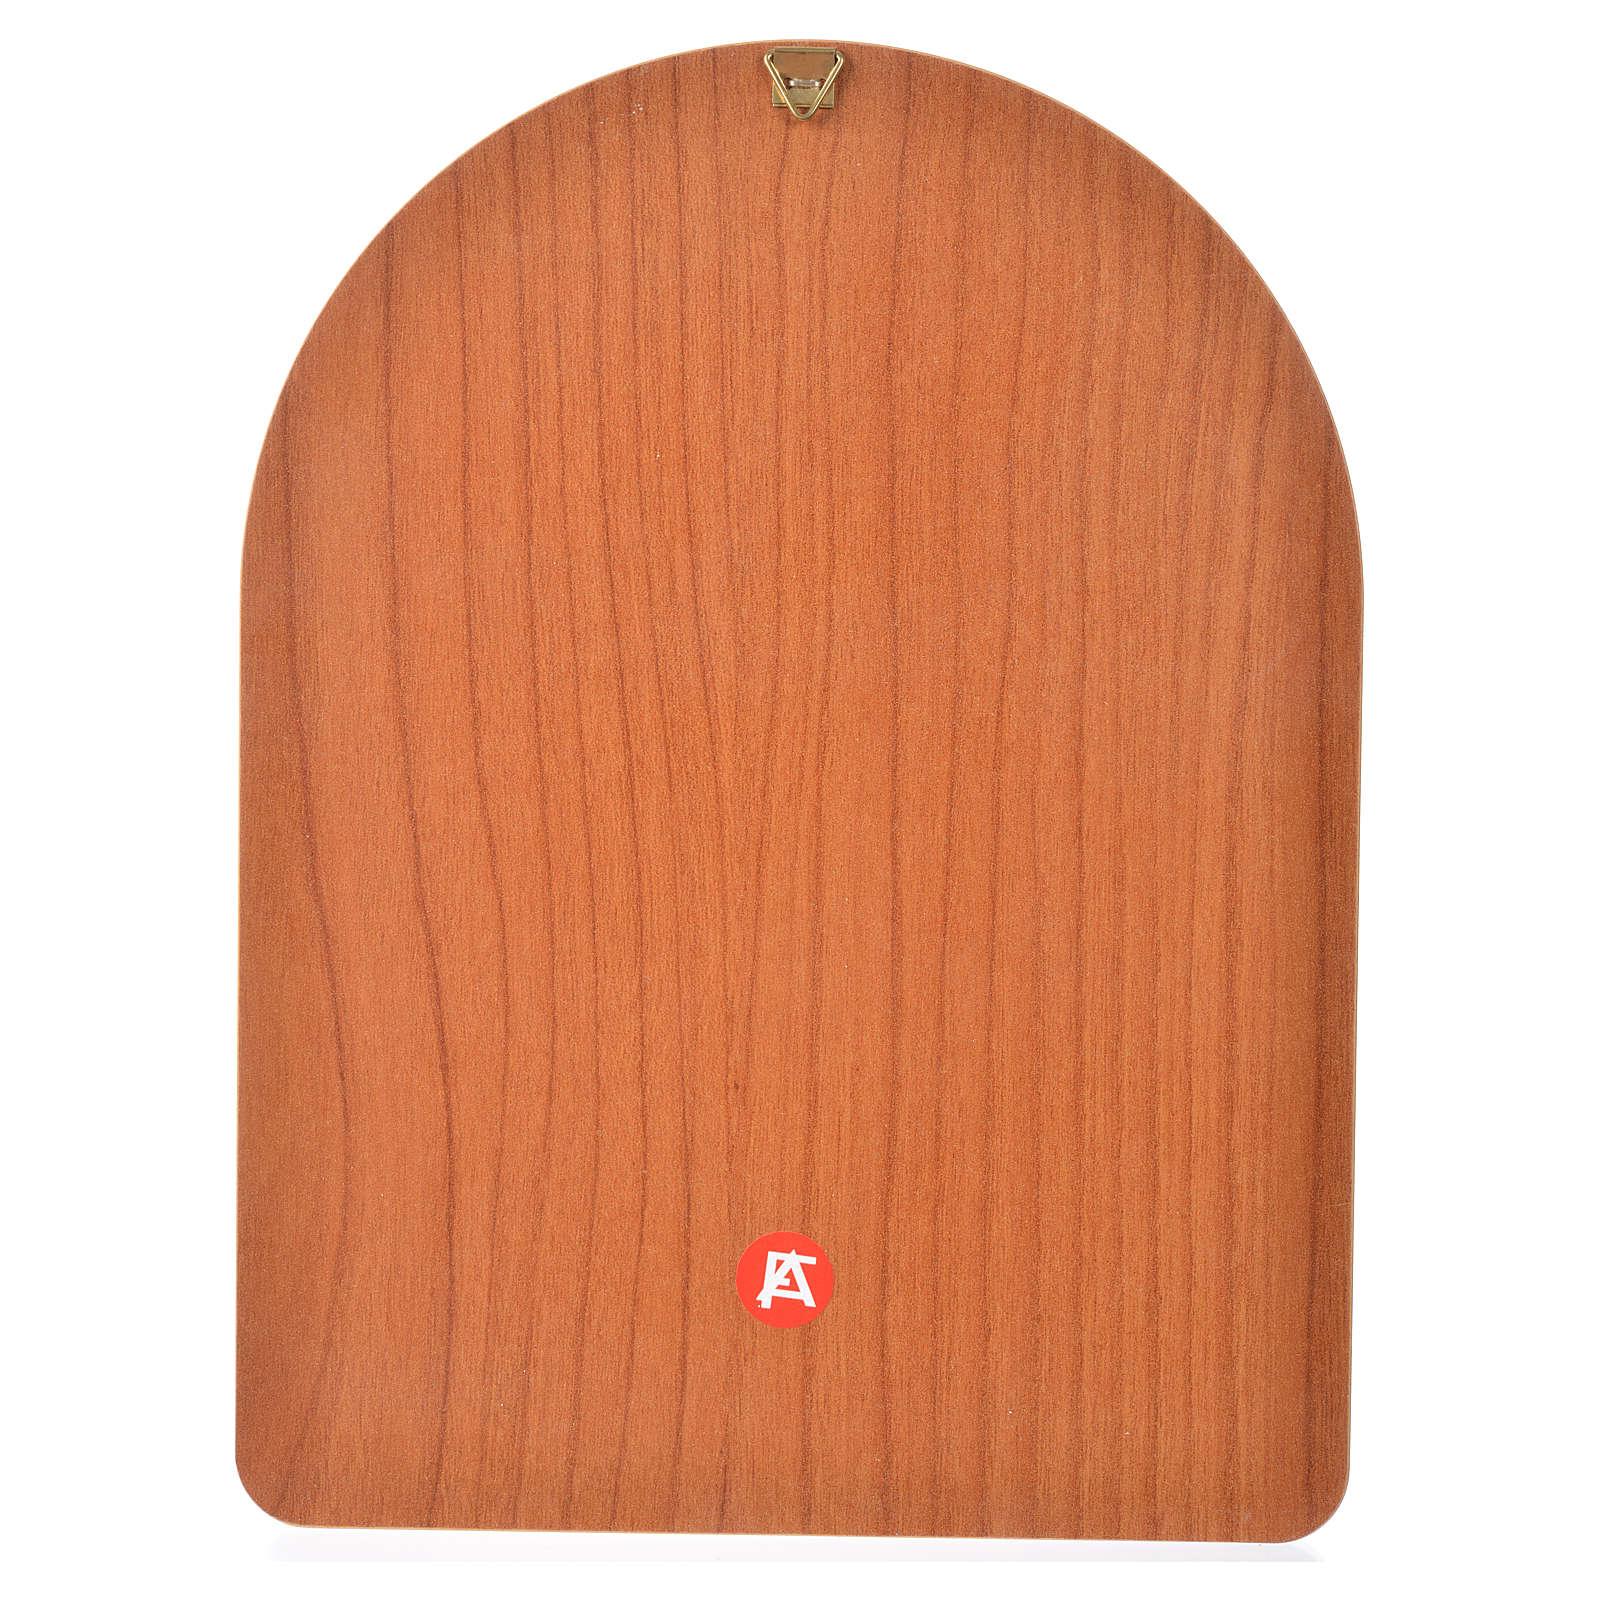 Estampa sobre madera 15x20 cm Jesús Misericordioso 3